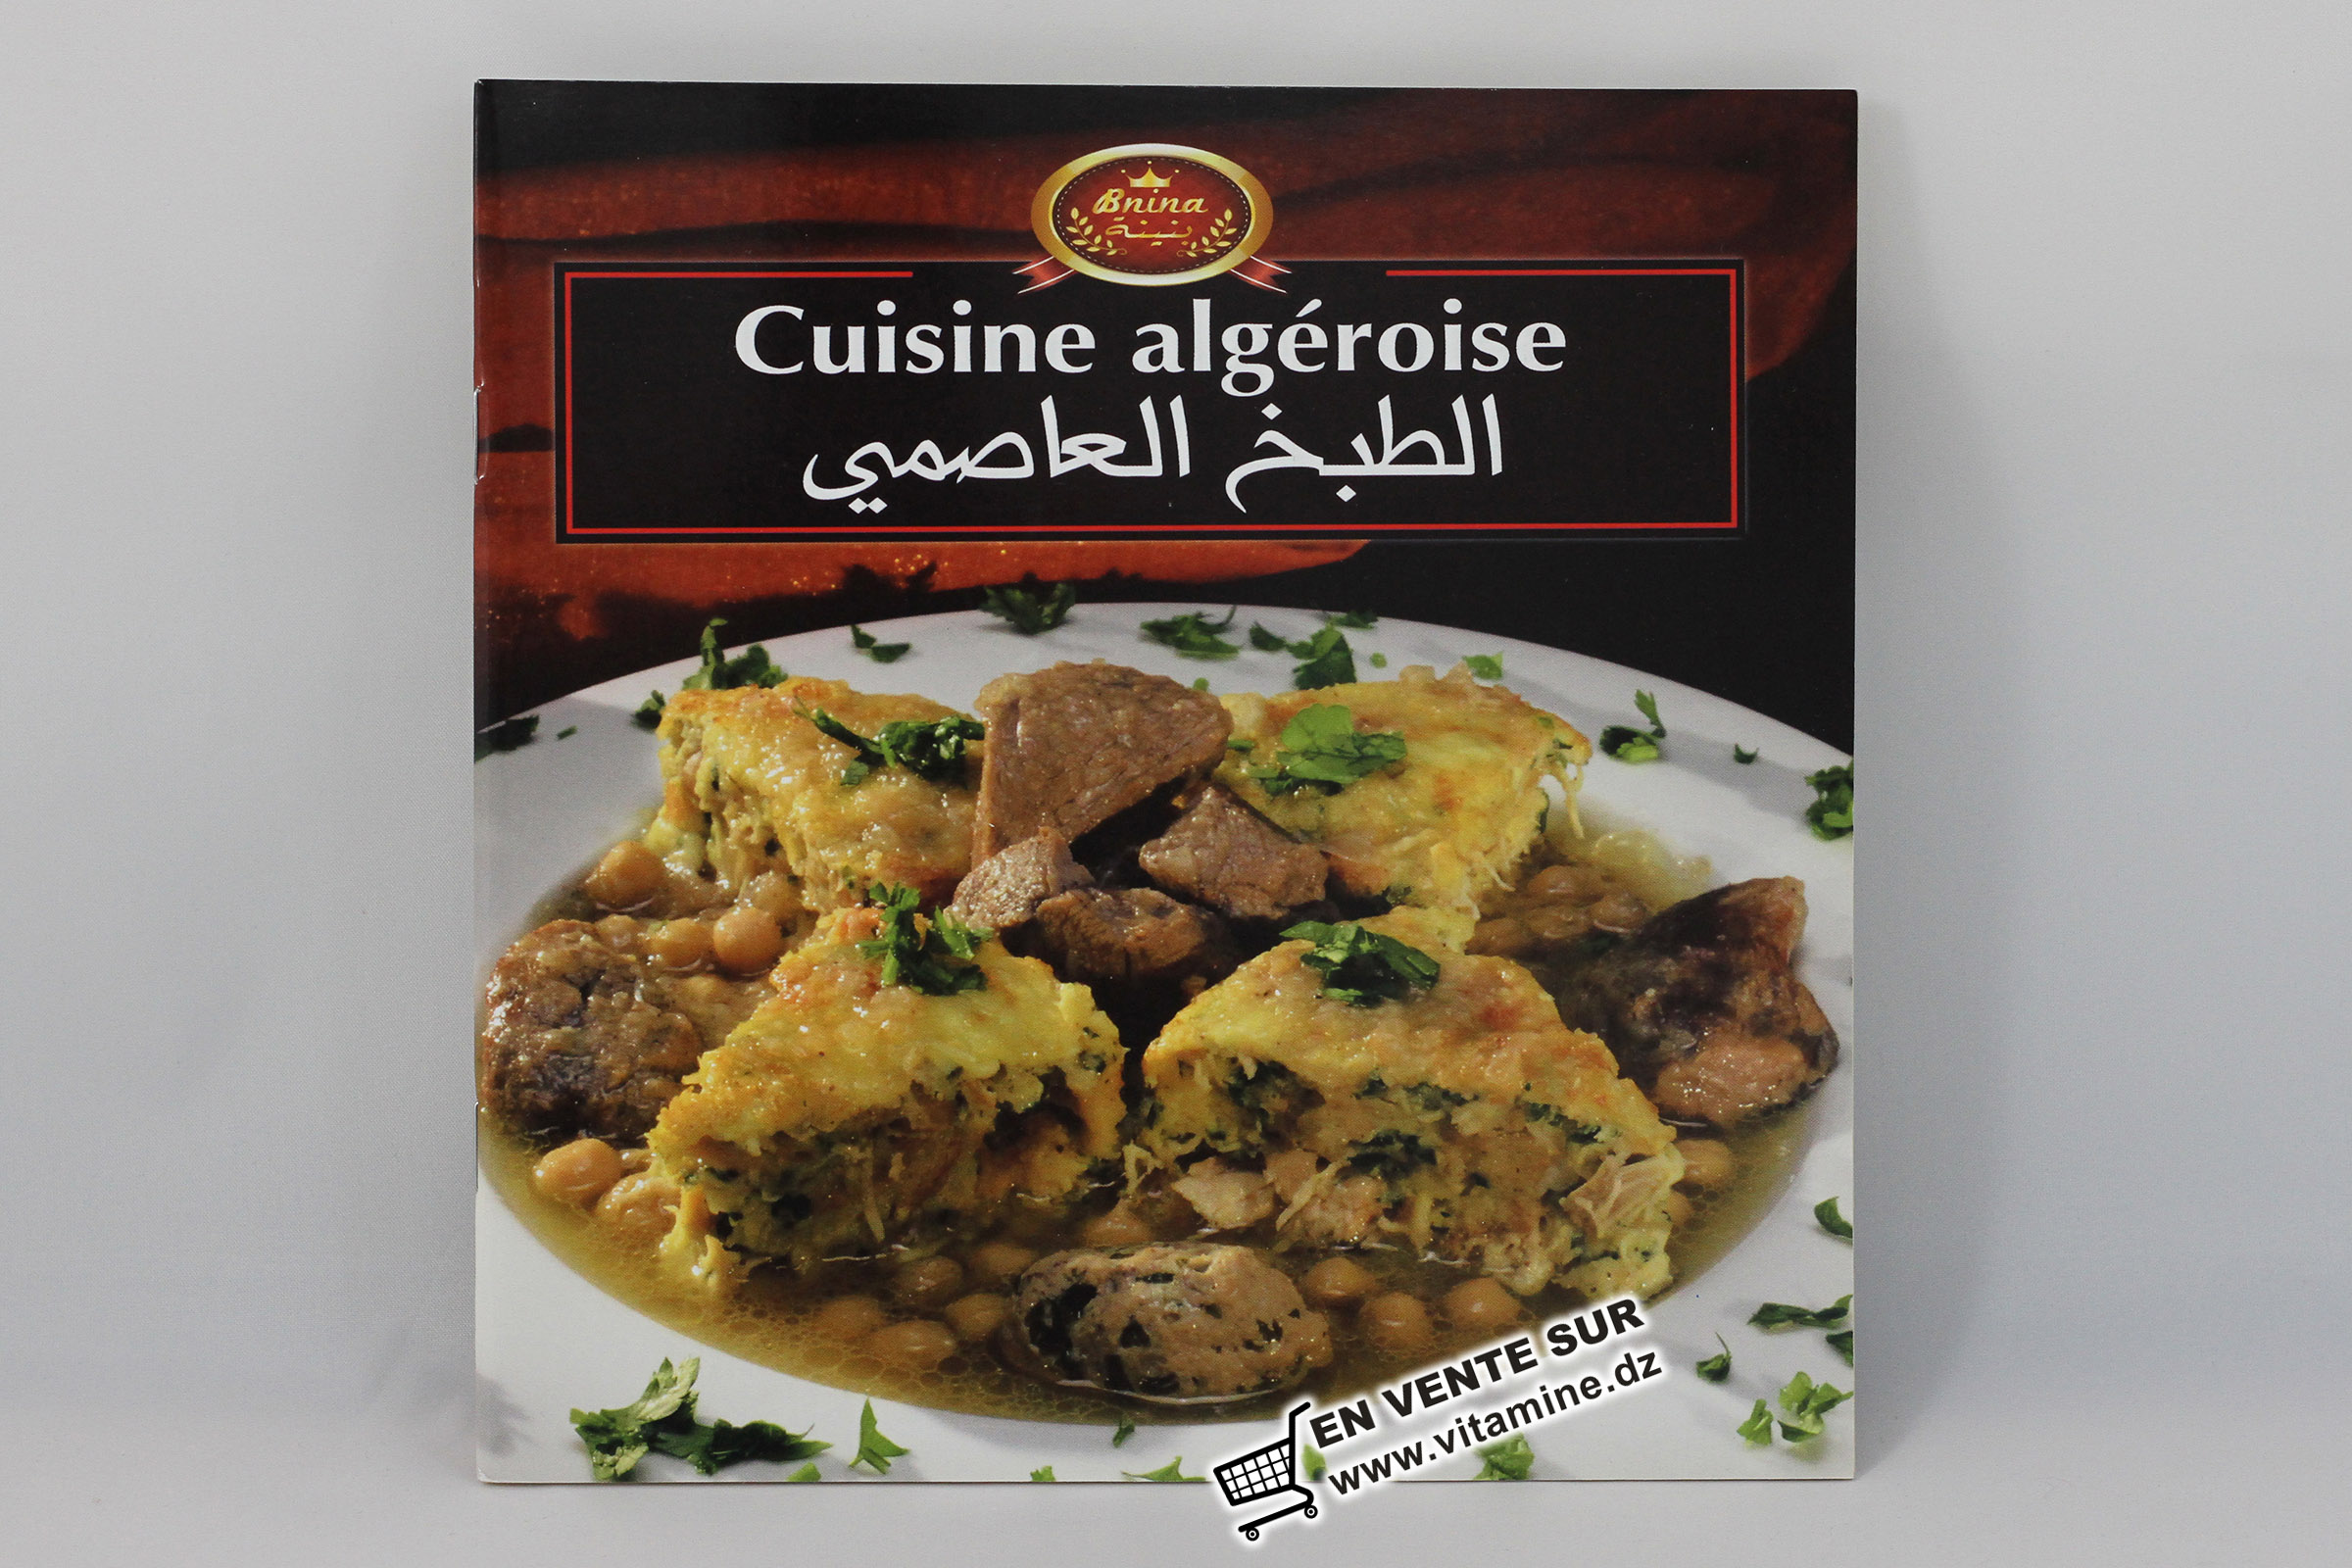 bnina - cuisine algéroise livres : cuisine